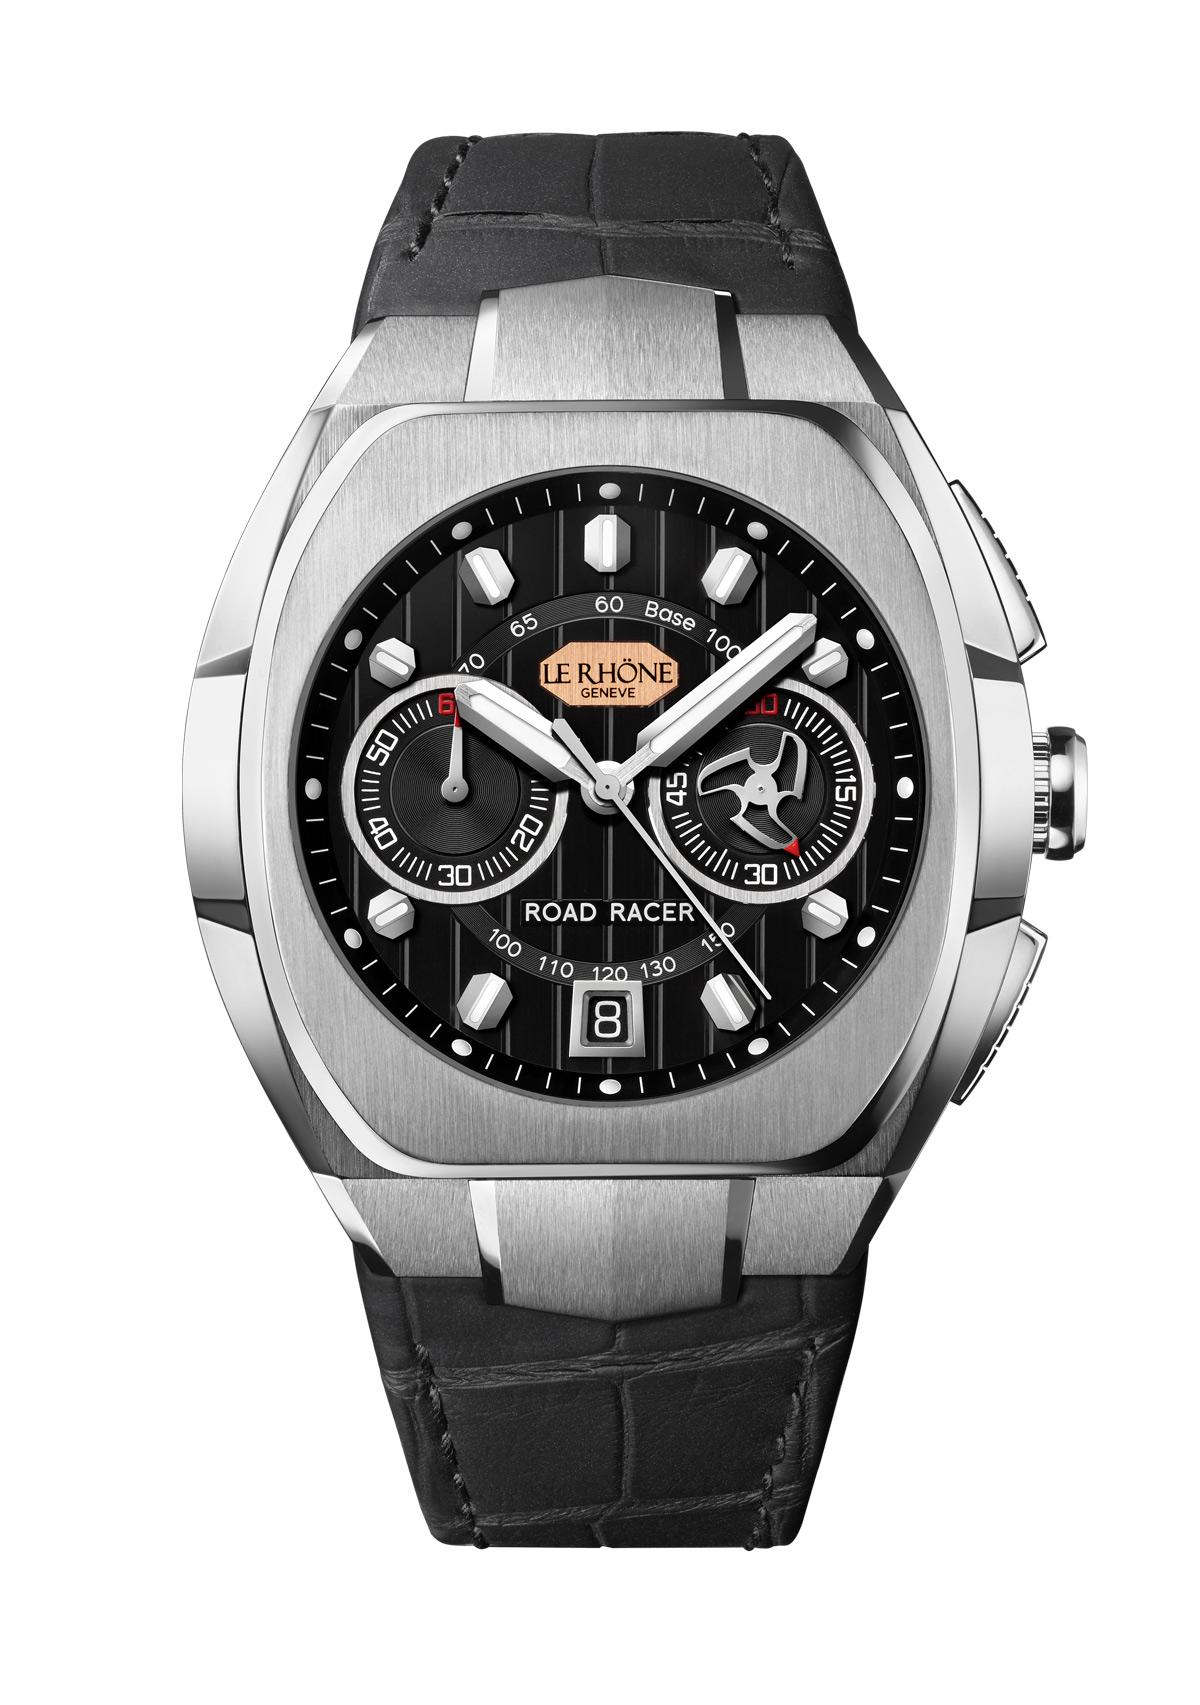 road-racer-le-rhone-watch-R1SS351-1-A99D-